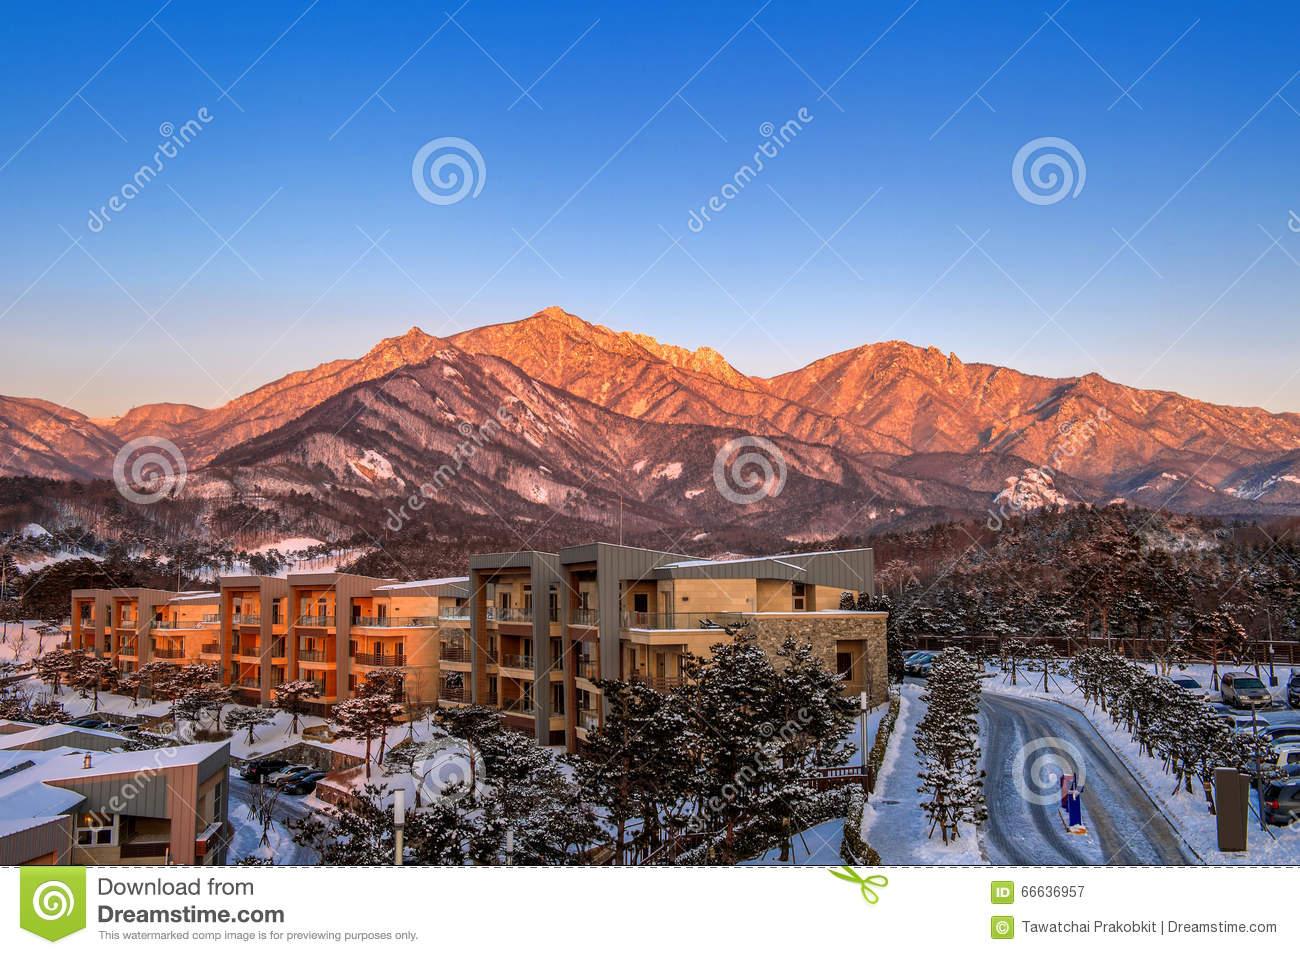 Ulsan Bawi Rock In Seoraksan Mountains In Winter, Korea. Stock.